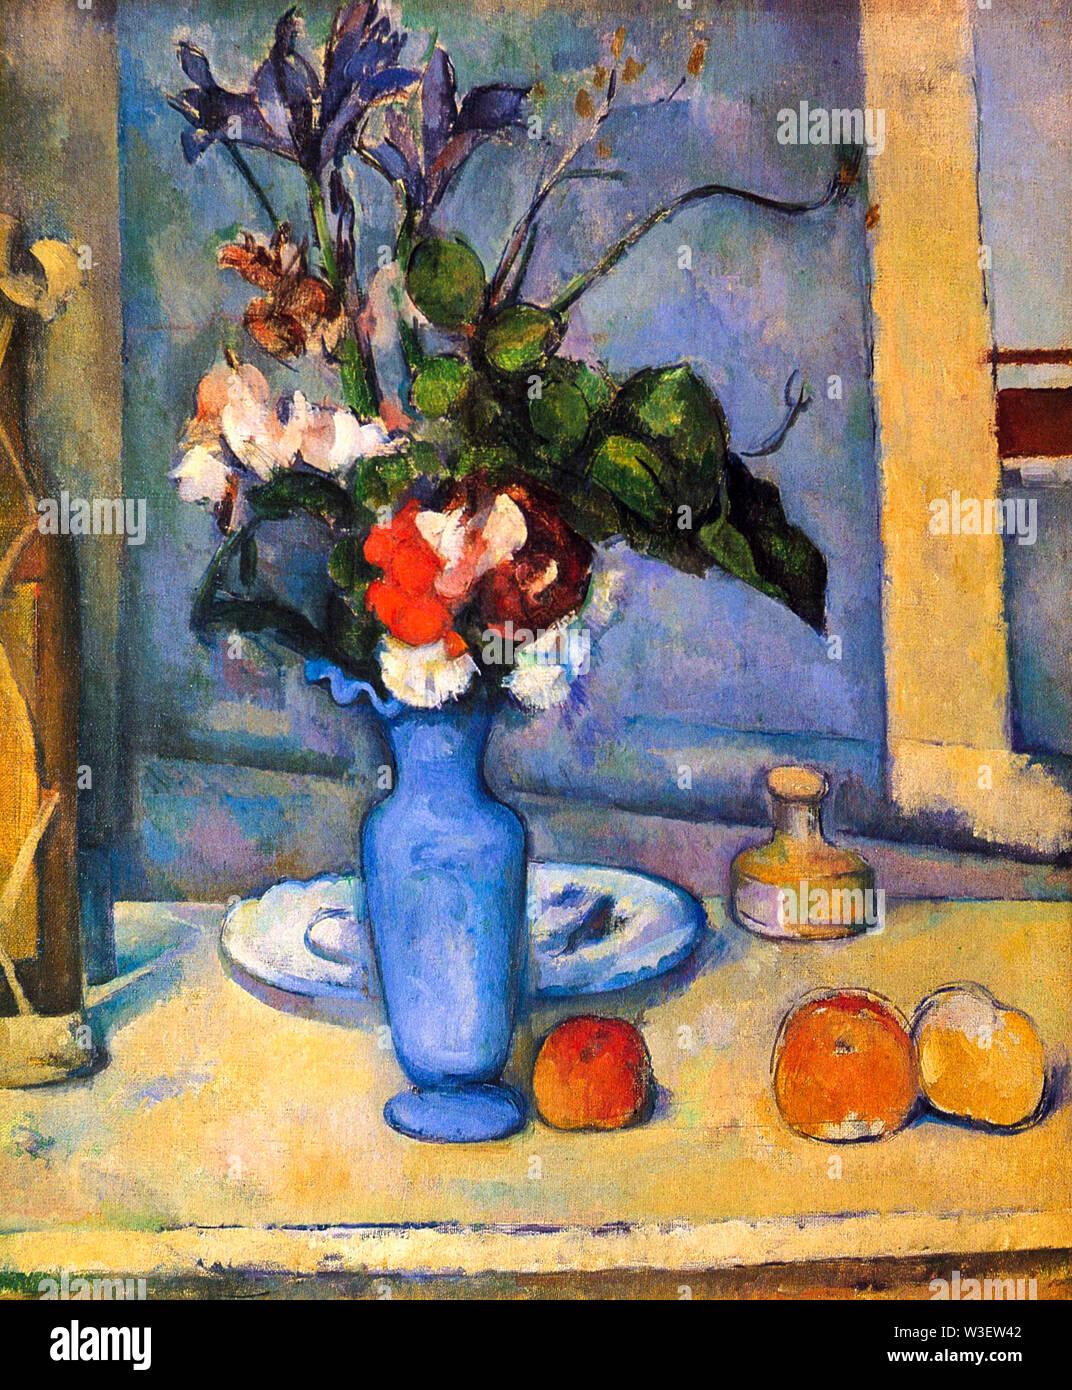 Paul Cézanne, le Vase Bleu, still life Painting, 1885-1887 Photo Stock